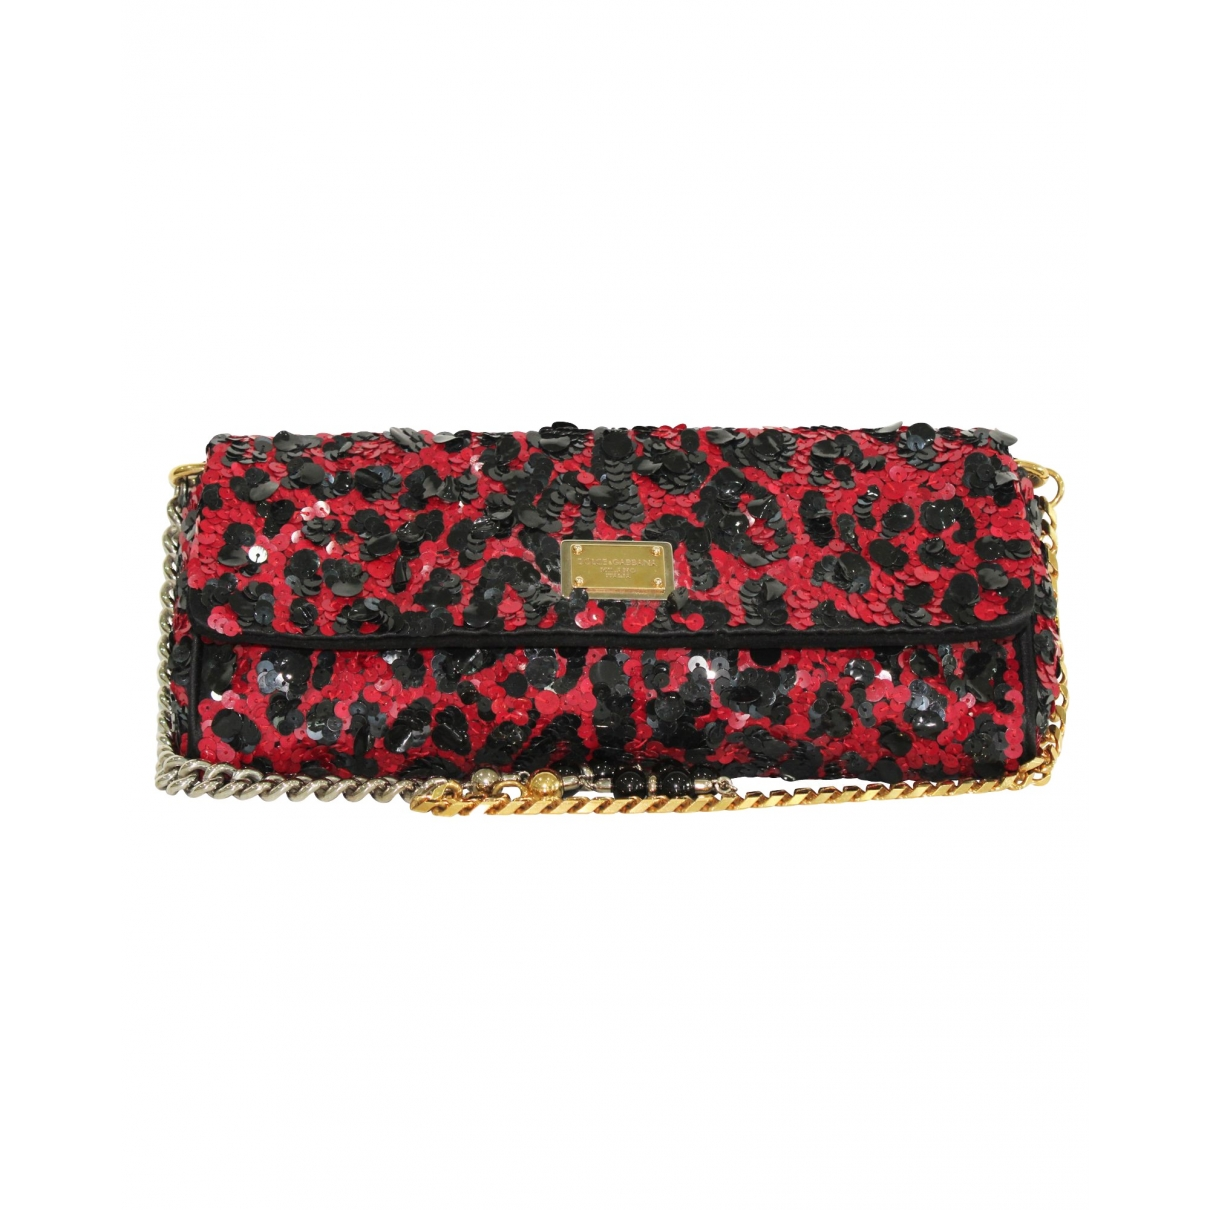 Dolce & Gabbana \N Red Glitter Clutch bag for Women \N